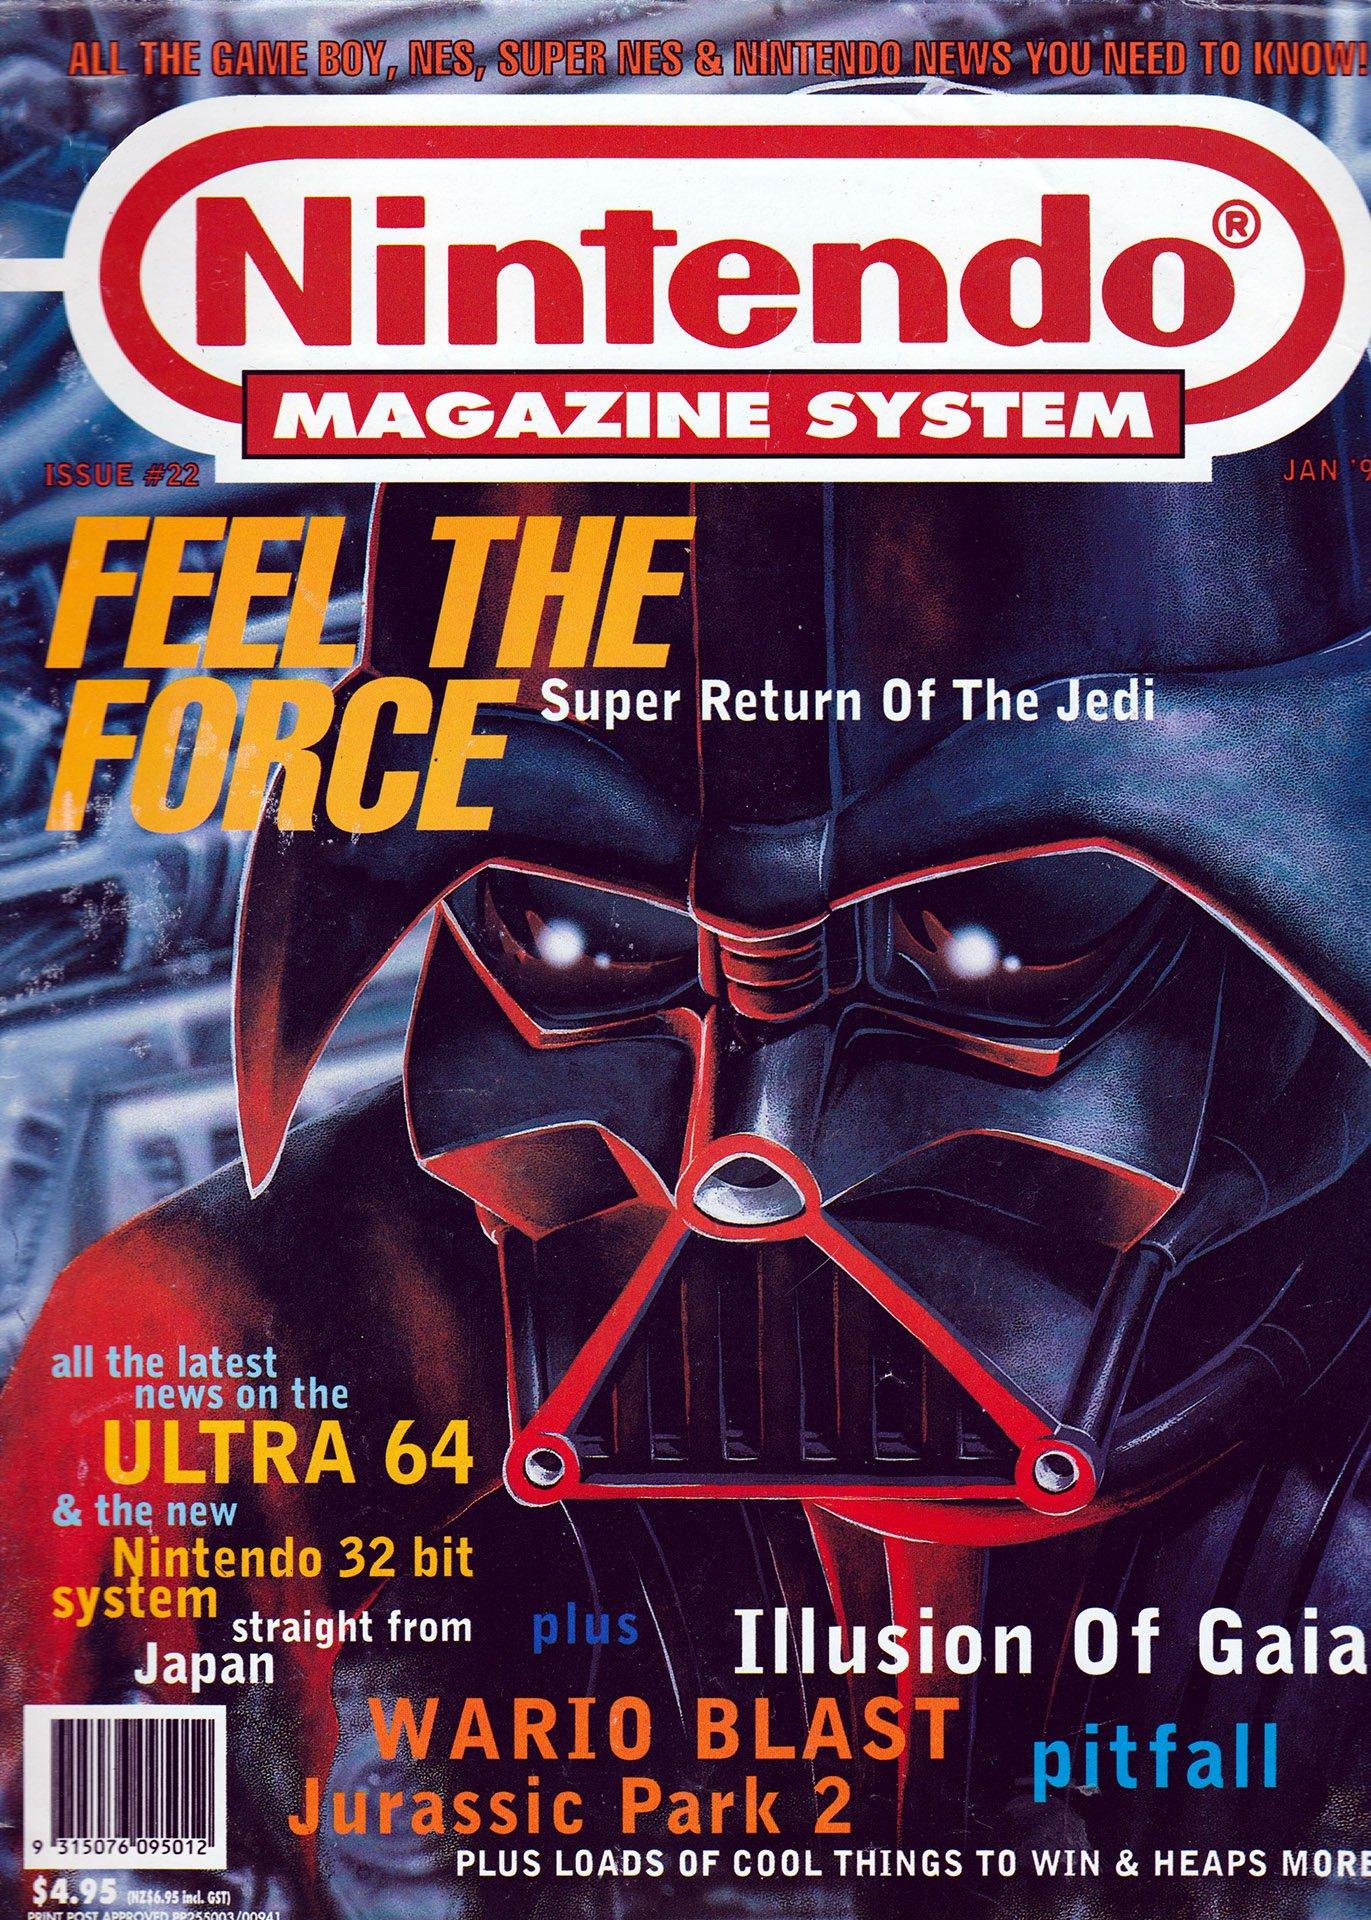 Nintendo Magazine System (AUS) 022 (January 1995)